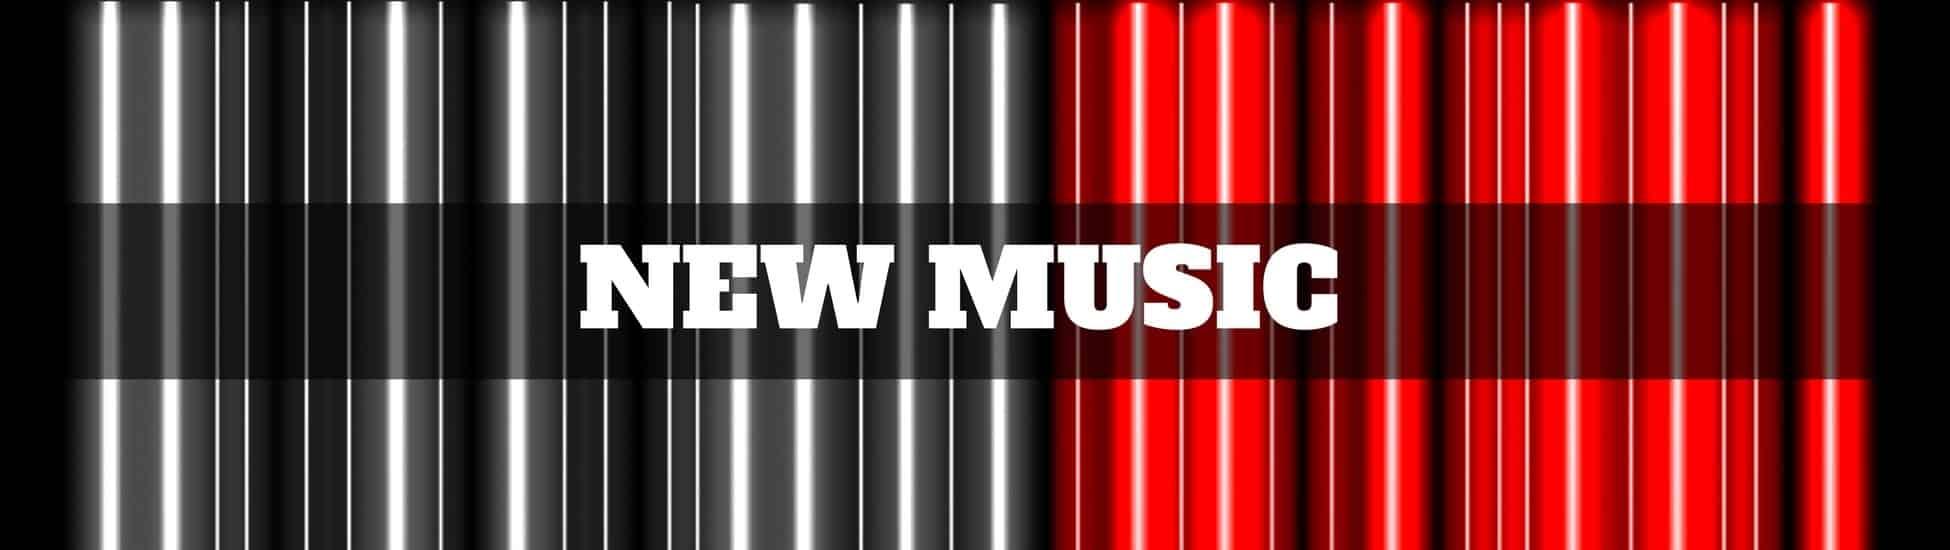 new music mi-soul